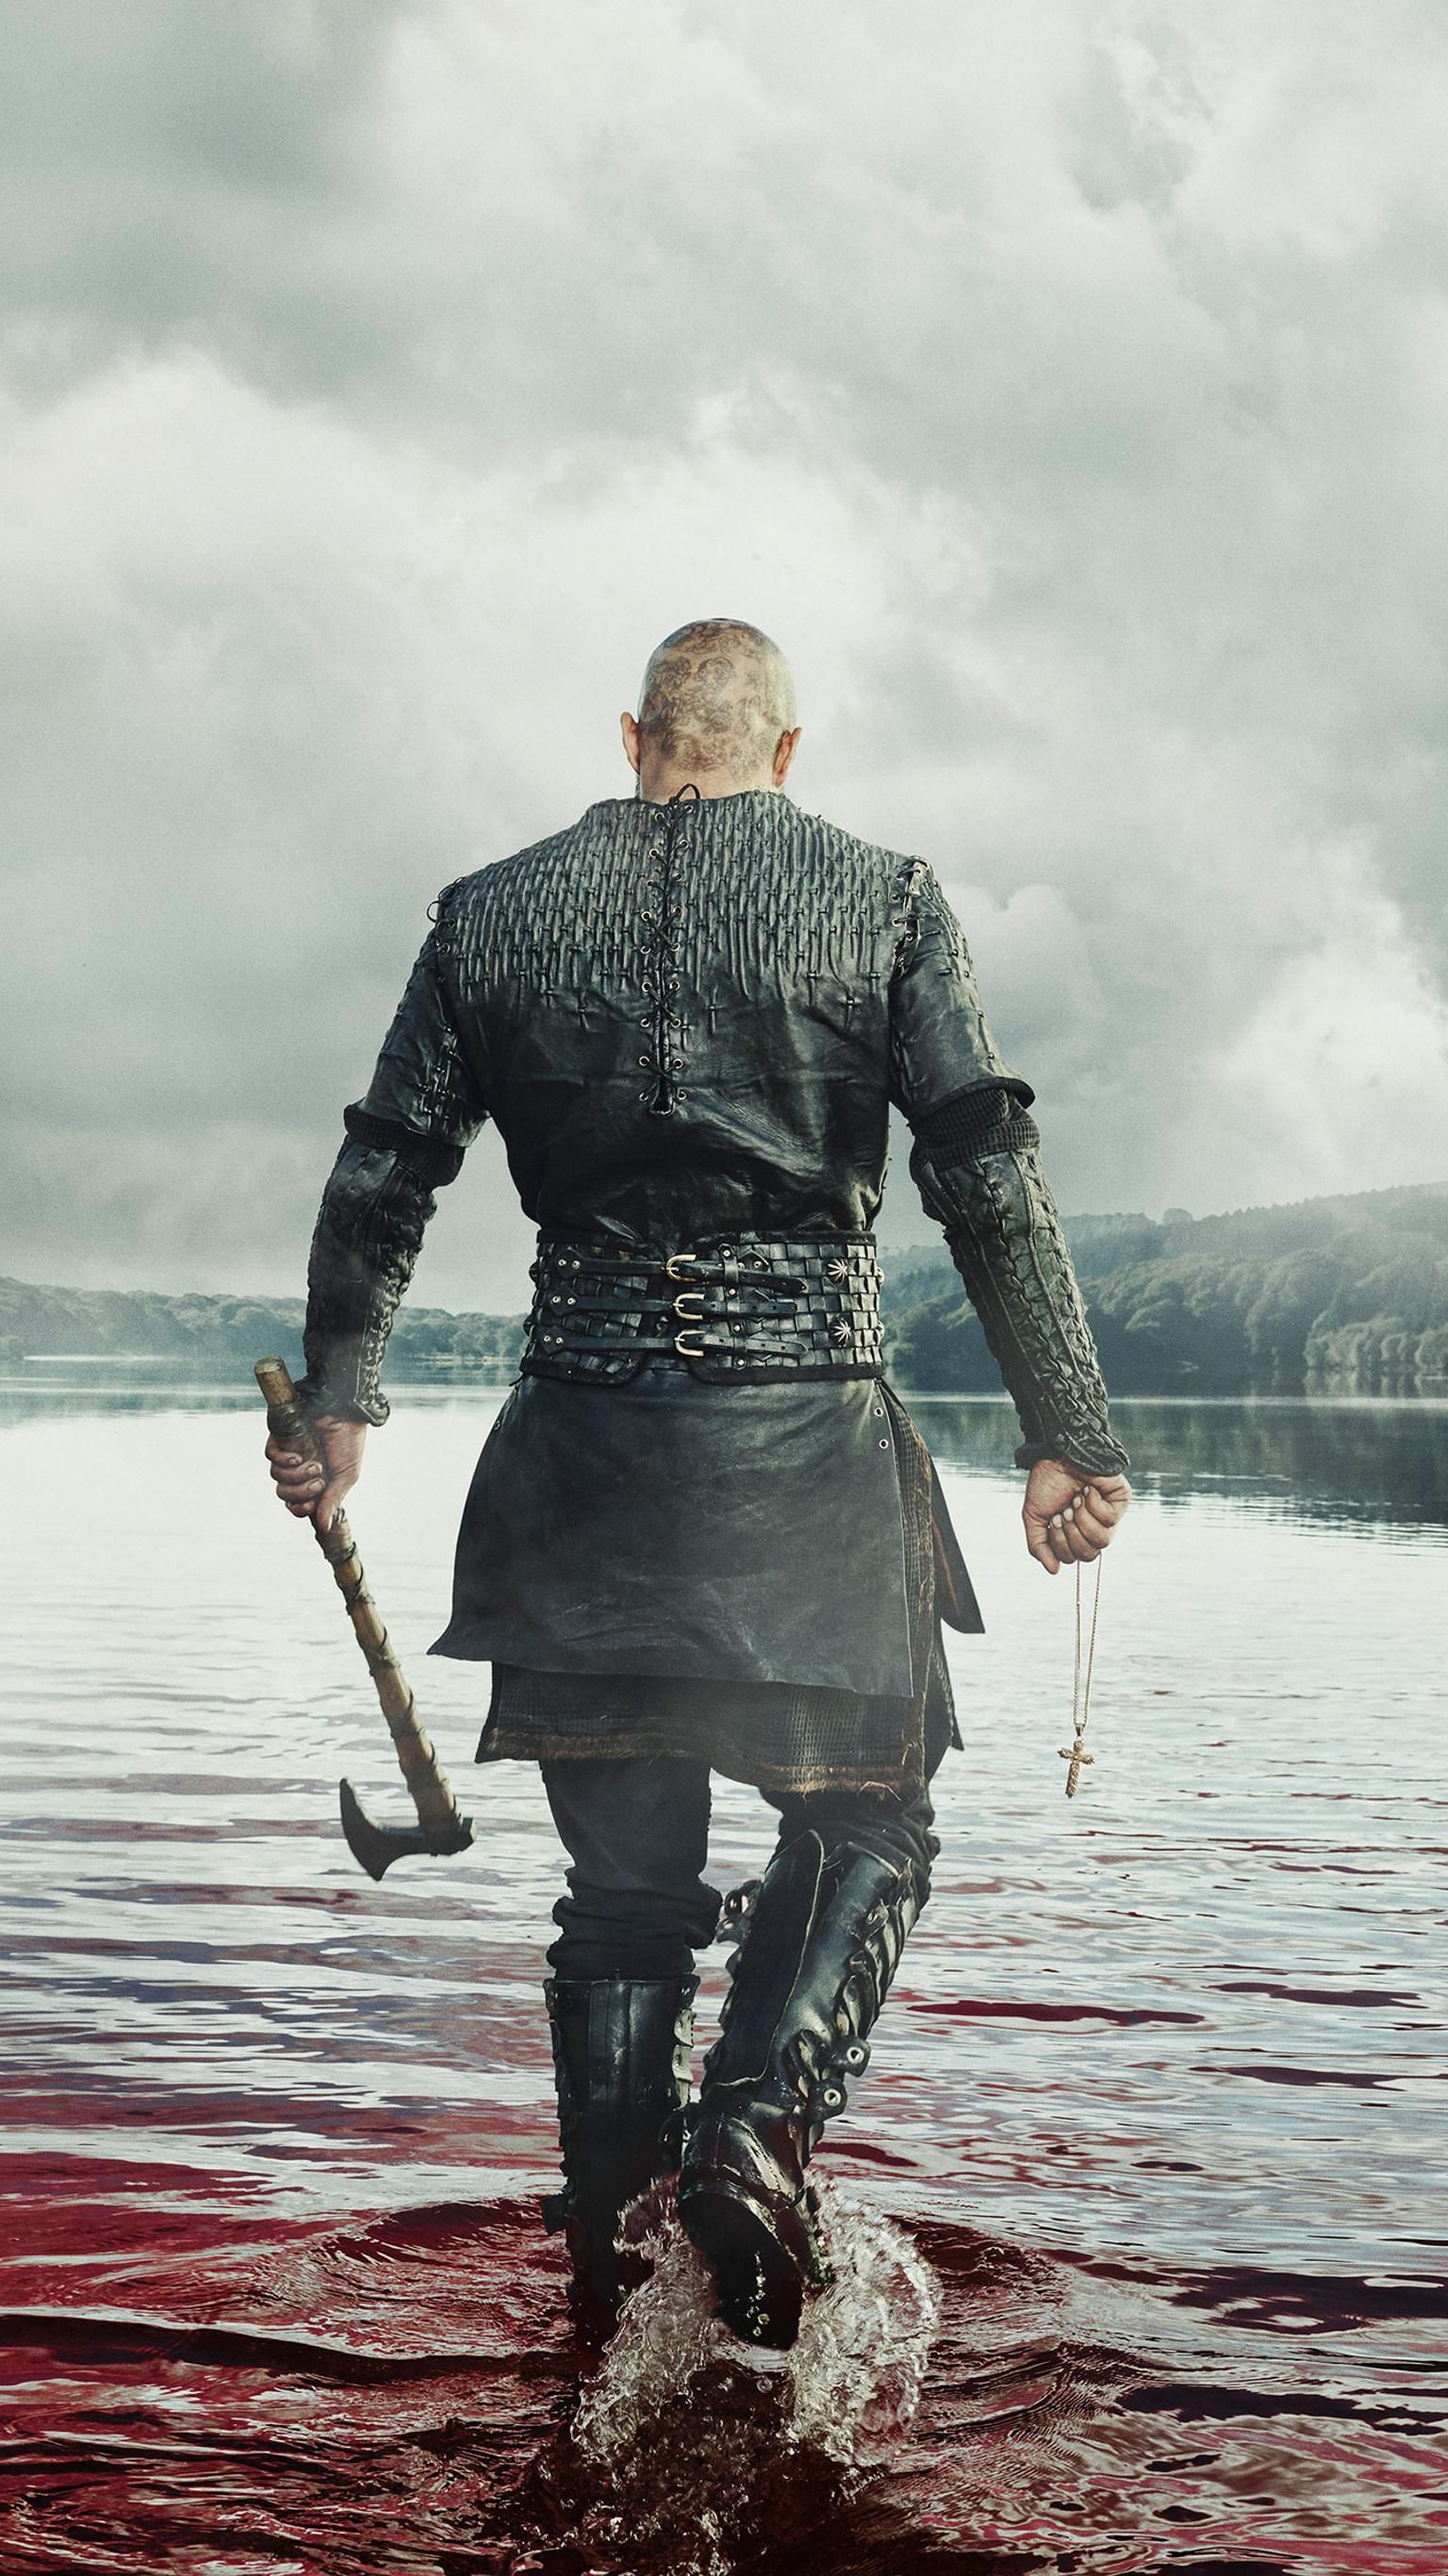 763b98d4 Vikings Phone Wallpaper in 2019 | Vikings | Ragnar lothbrok vikings ...